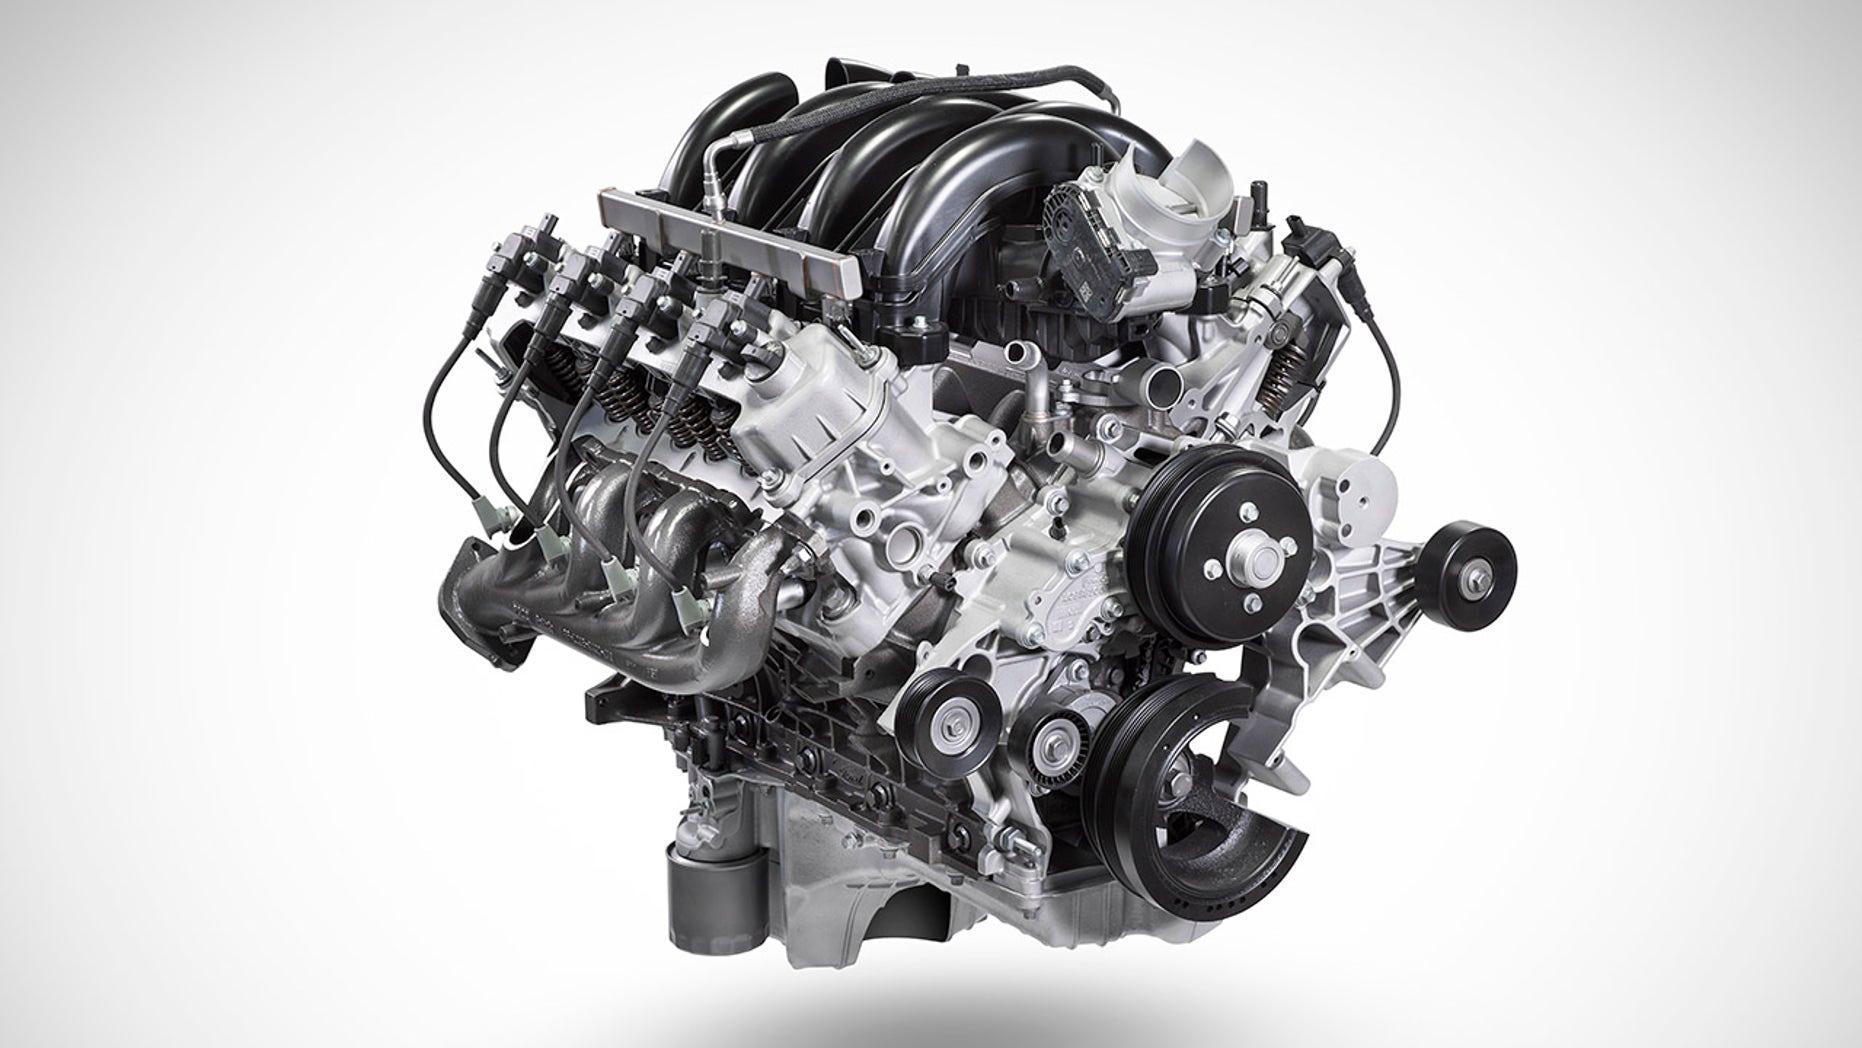 2020 Ford F-Series Super Duty Engine